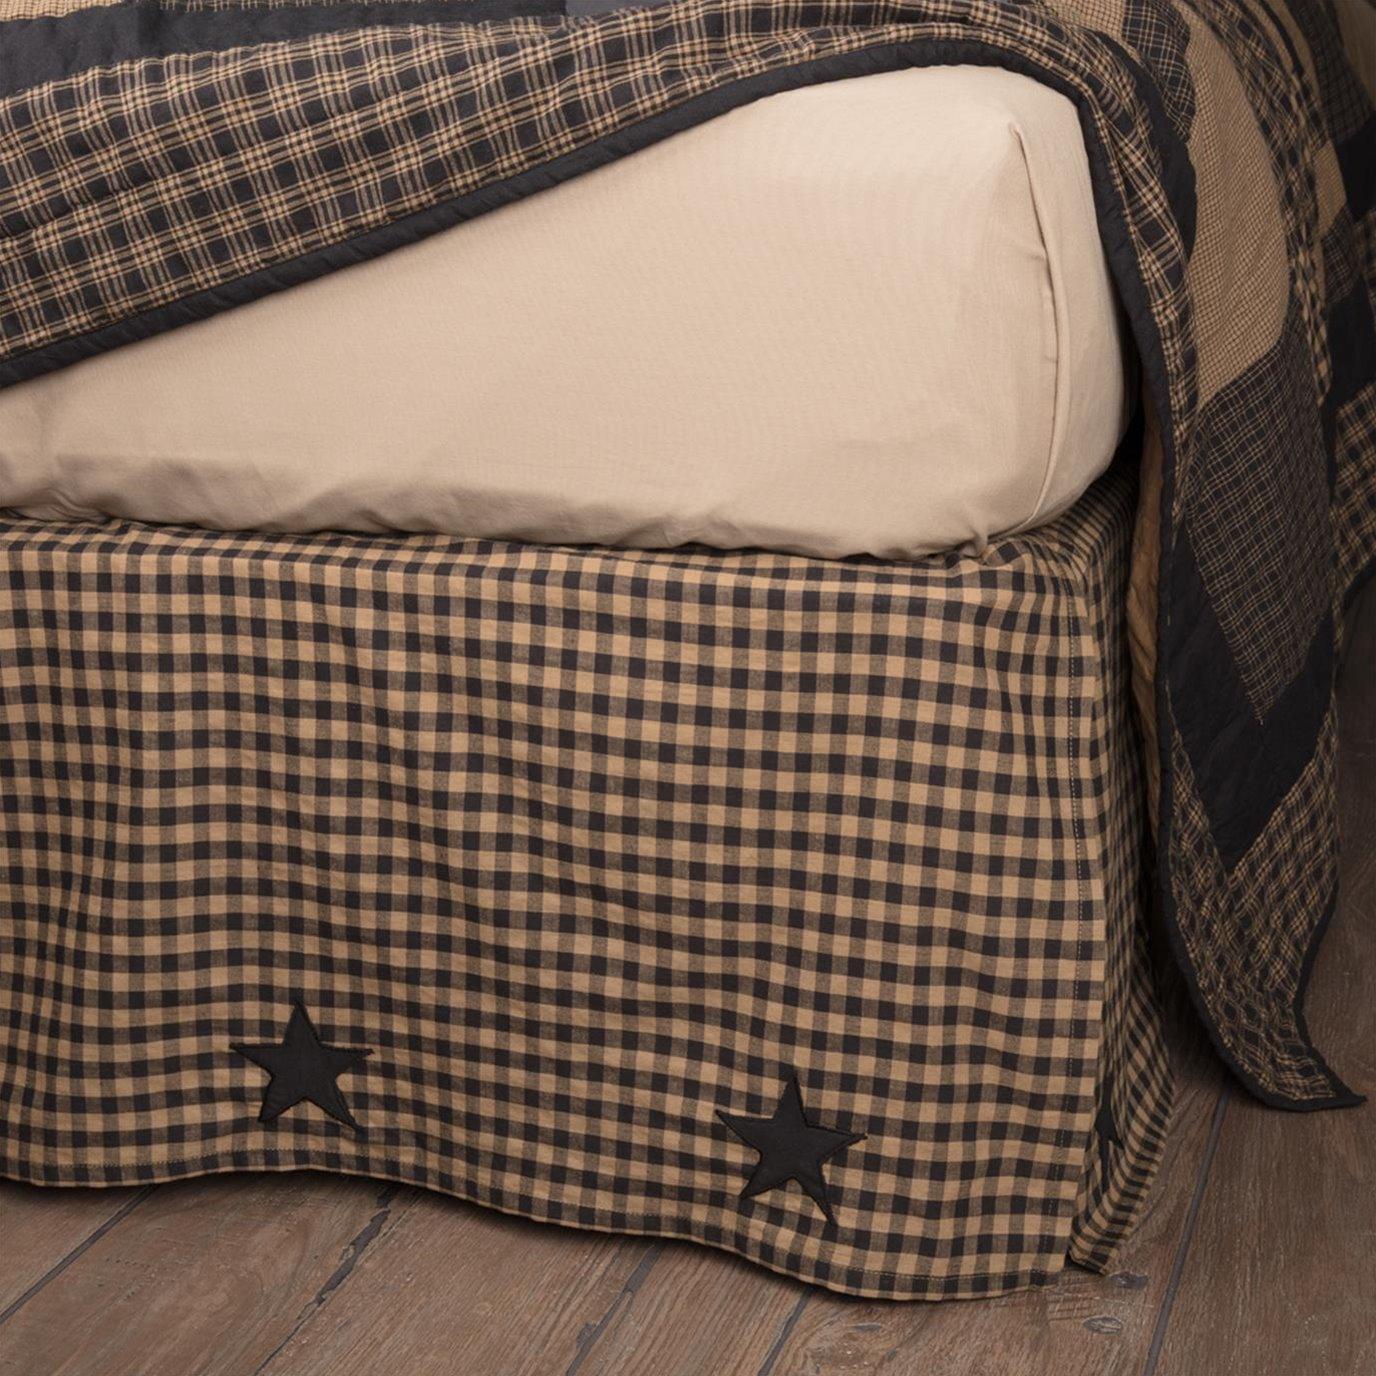 Black Check Star Twin Bed Skirt 39x76x16